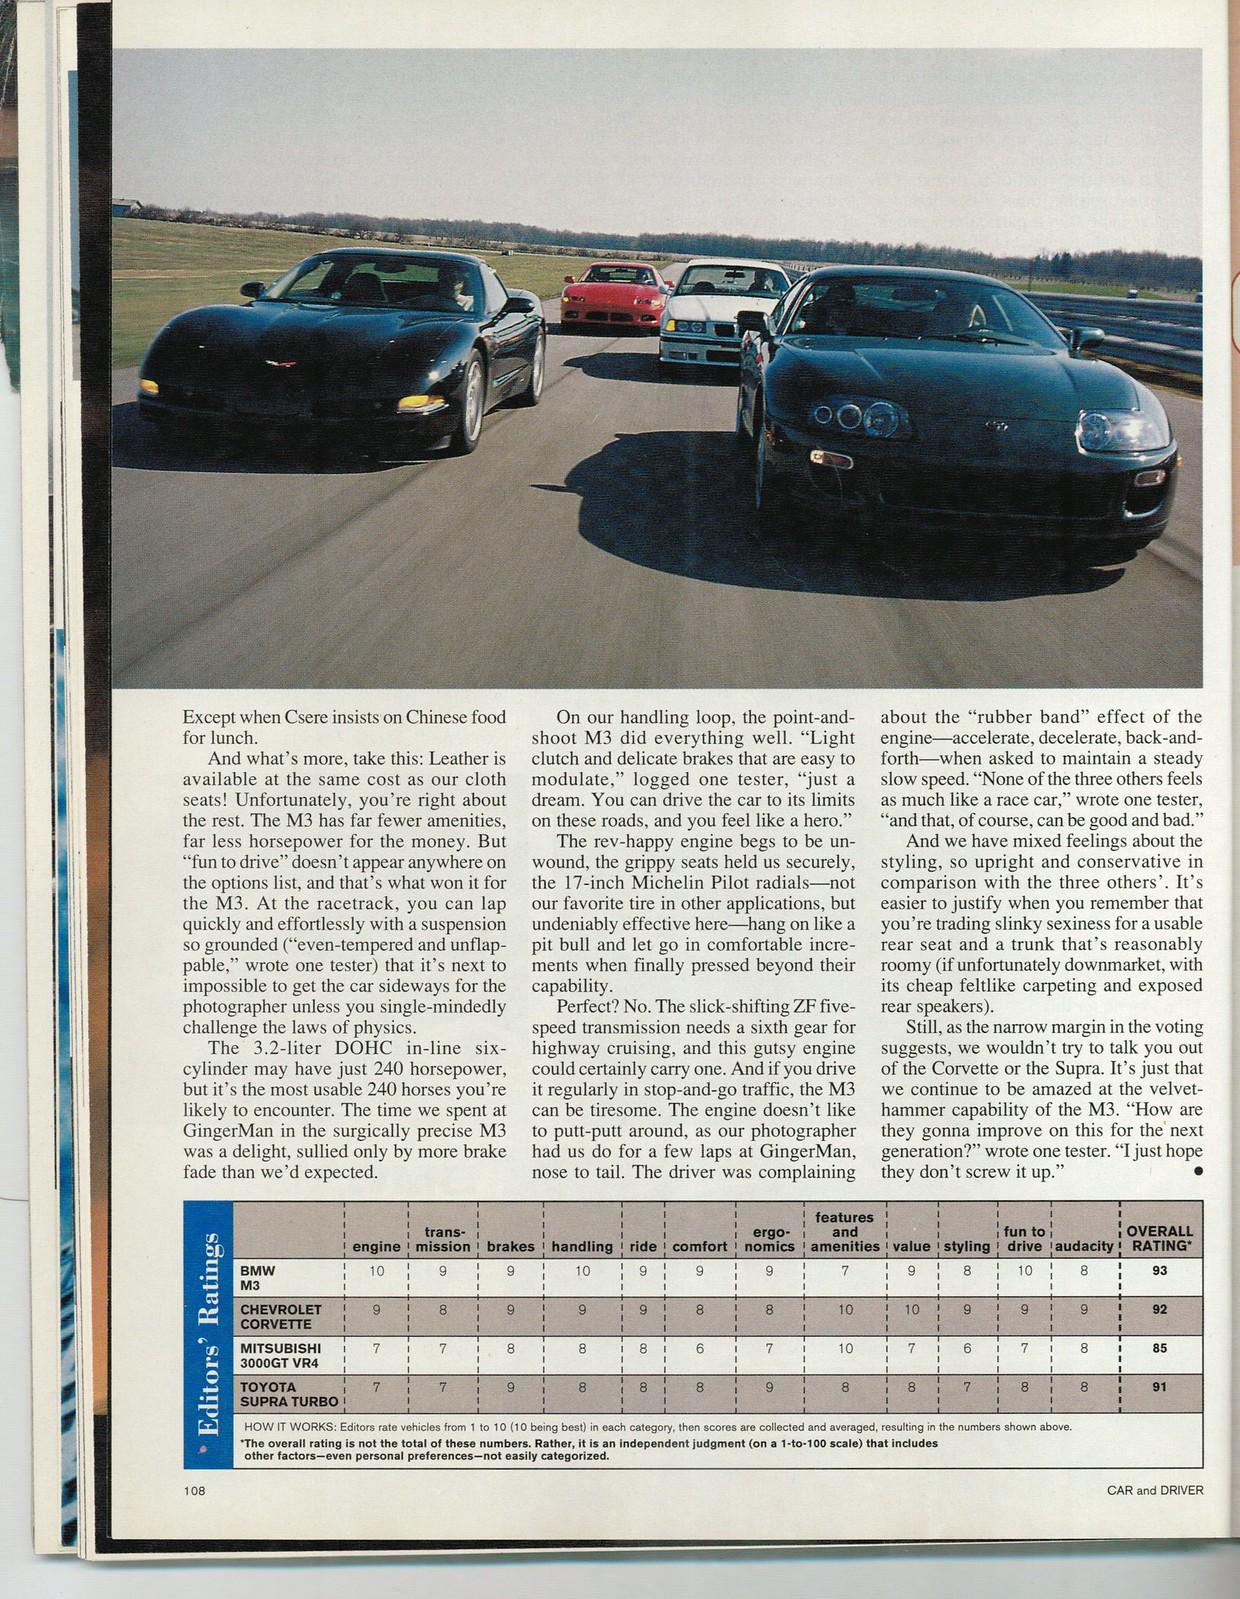 VWVortex com - C&D Retro Comparison: BMW M3 vs Corvette vs